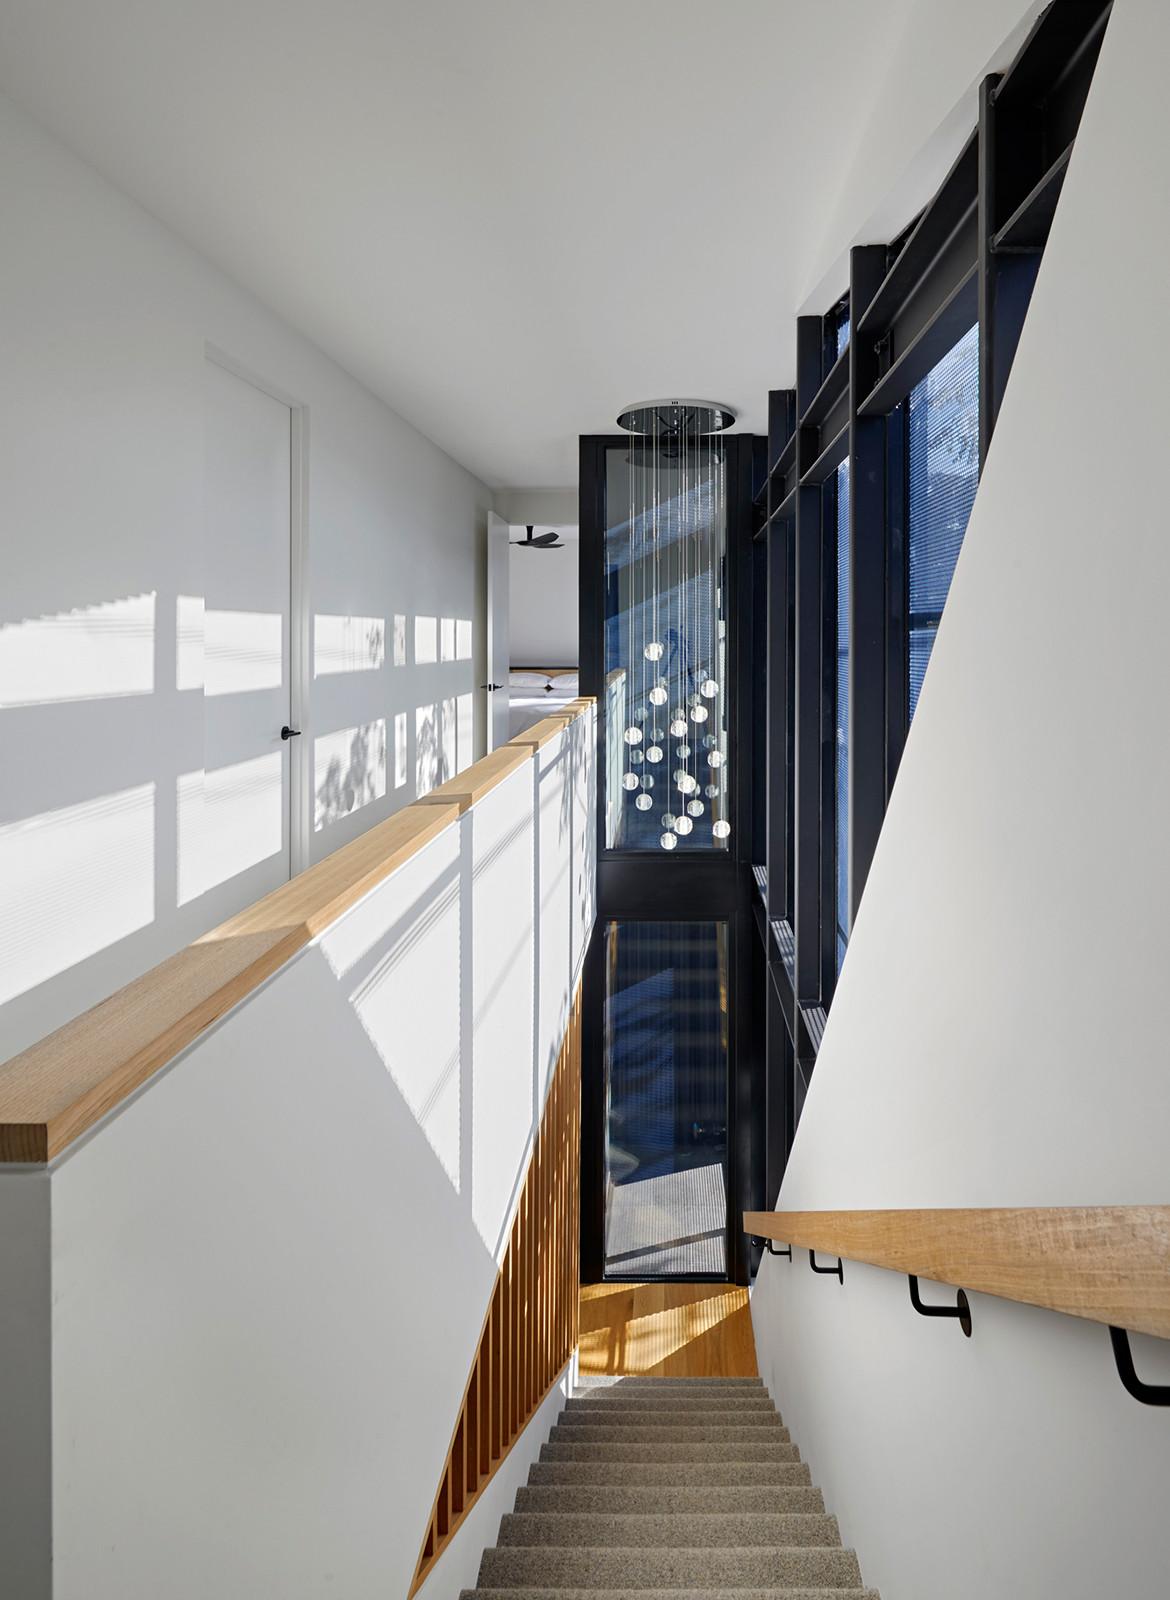 Boundary Street House Chan Architecture CC Tatjana Plitt stairs down